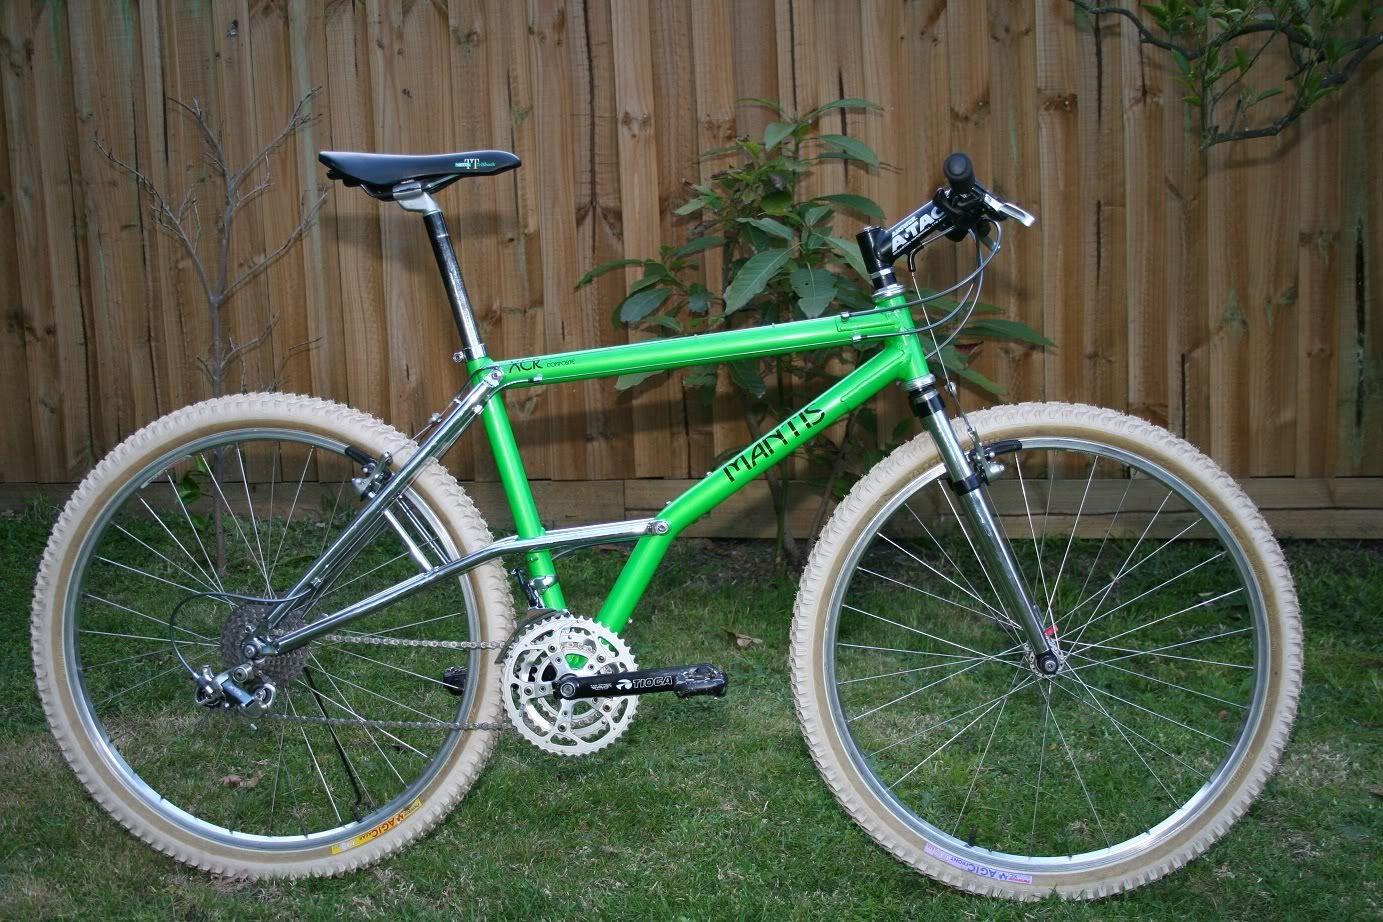 Mantis Xcr Bicicletas Bici